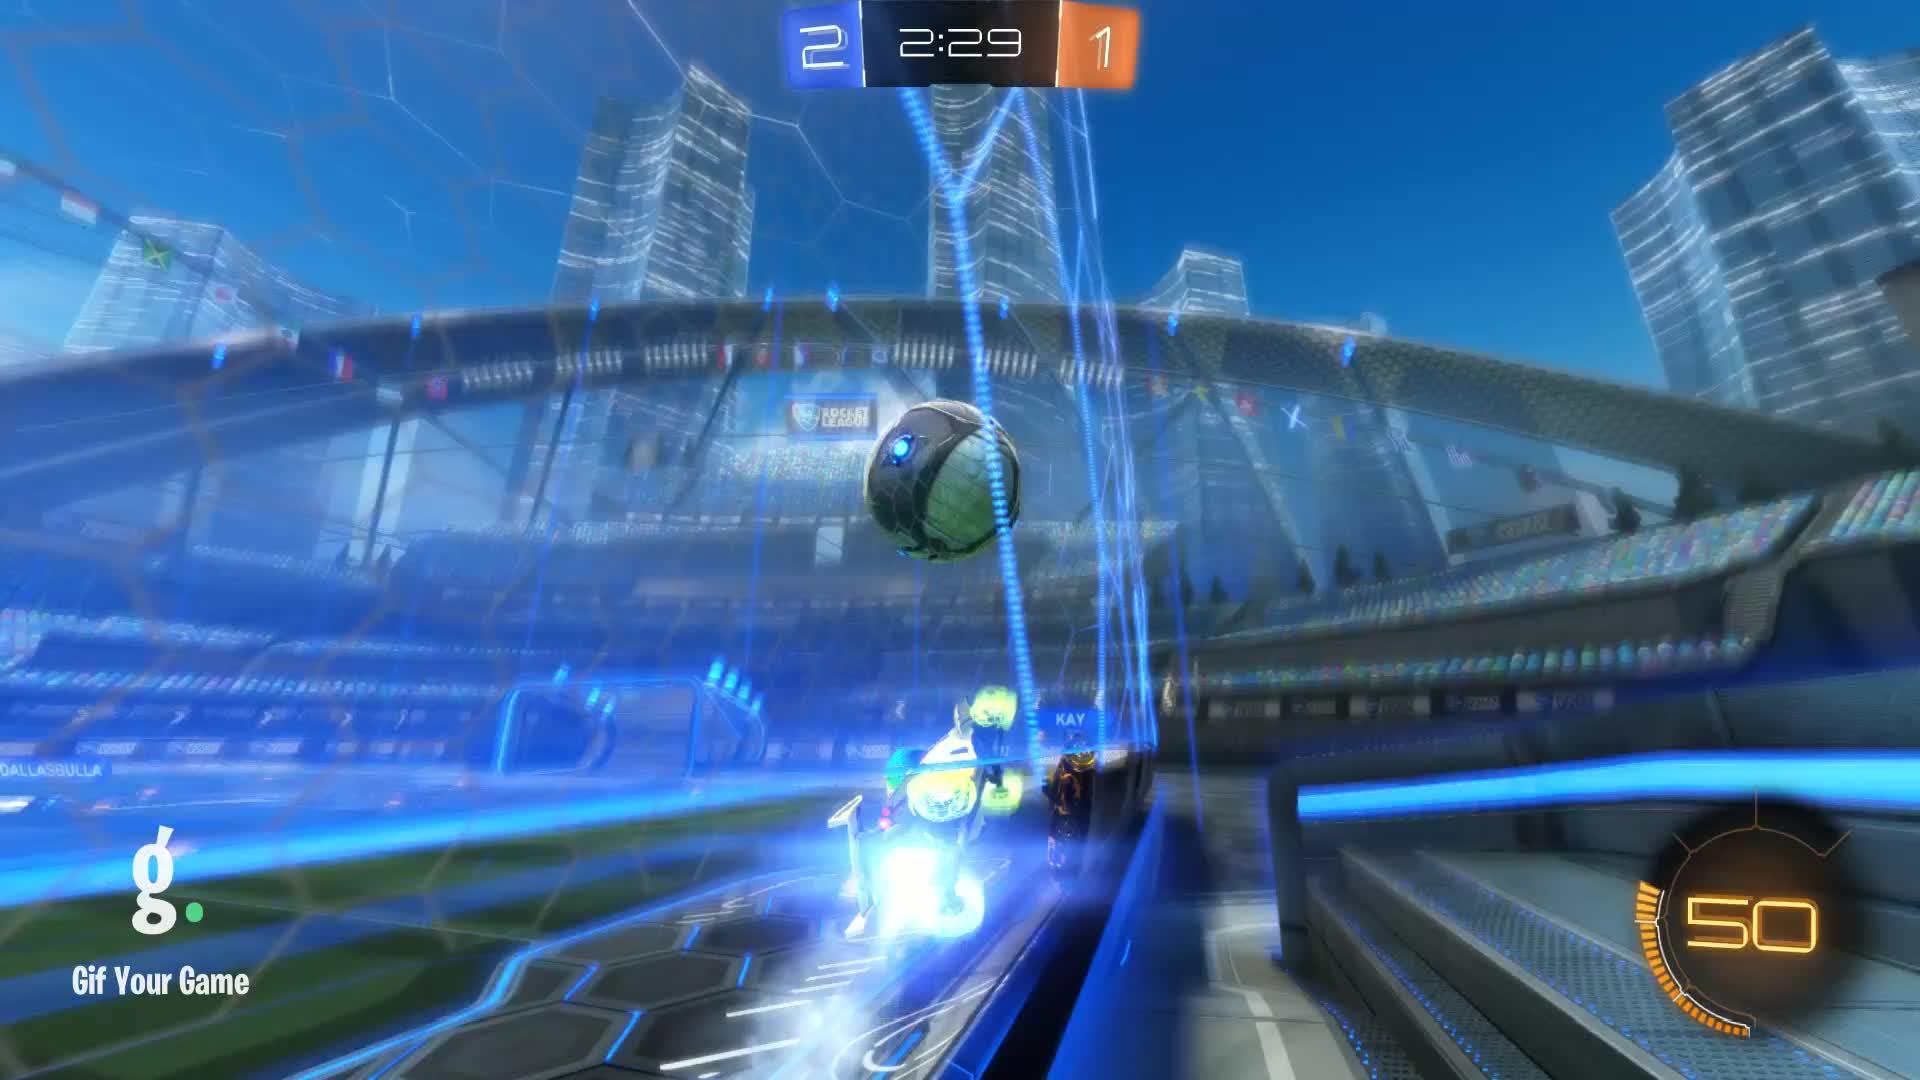 Gif Your Game, GifYourGame, Goal, Rocket League, RocketLeague, ninjaboby, ⏱️ Goal 4: Zephyr GIFs